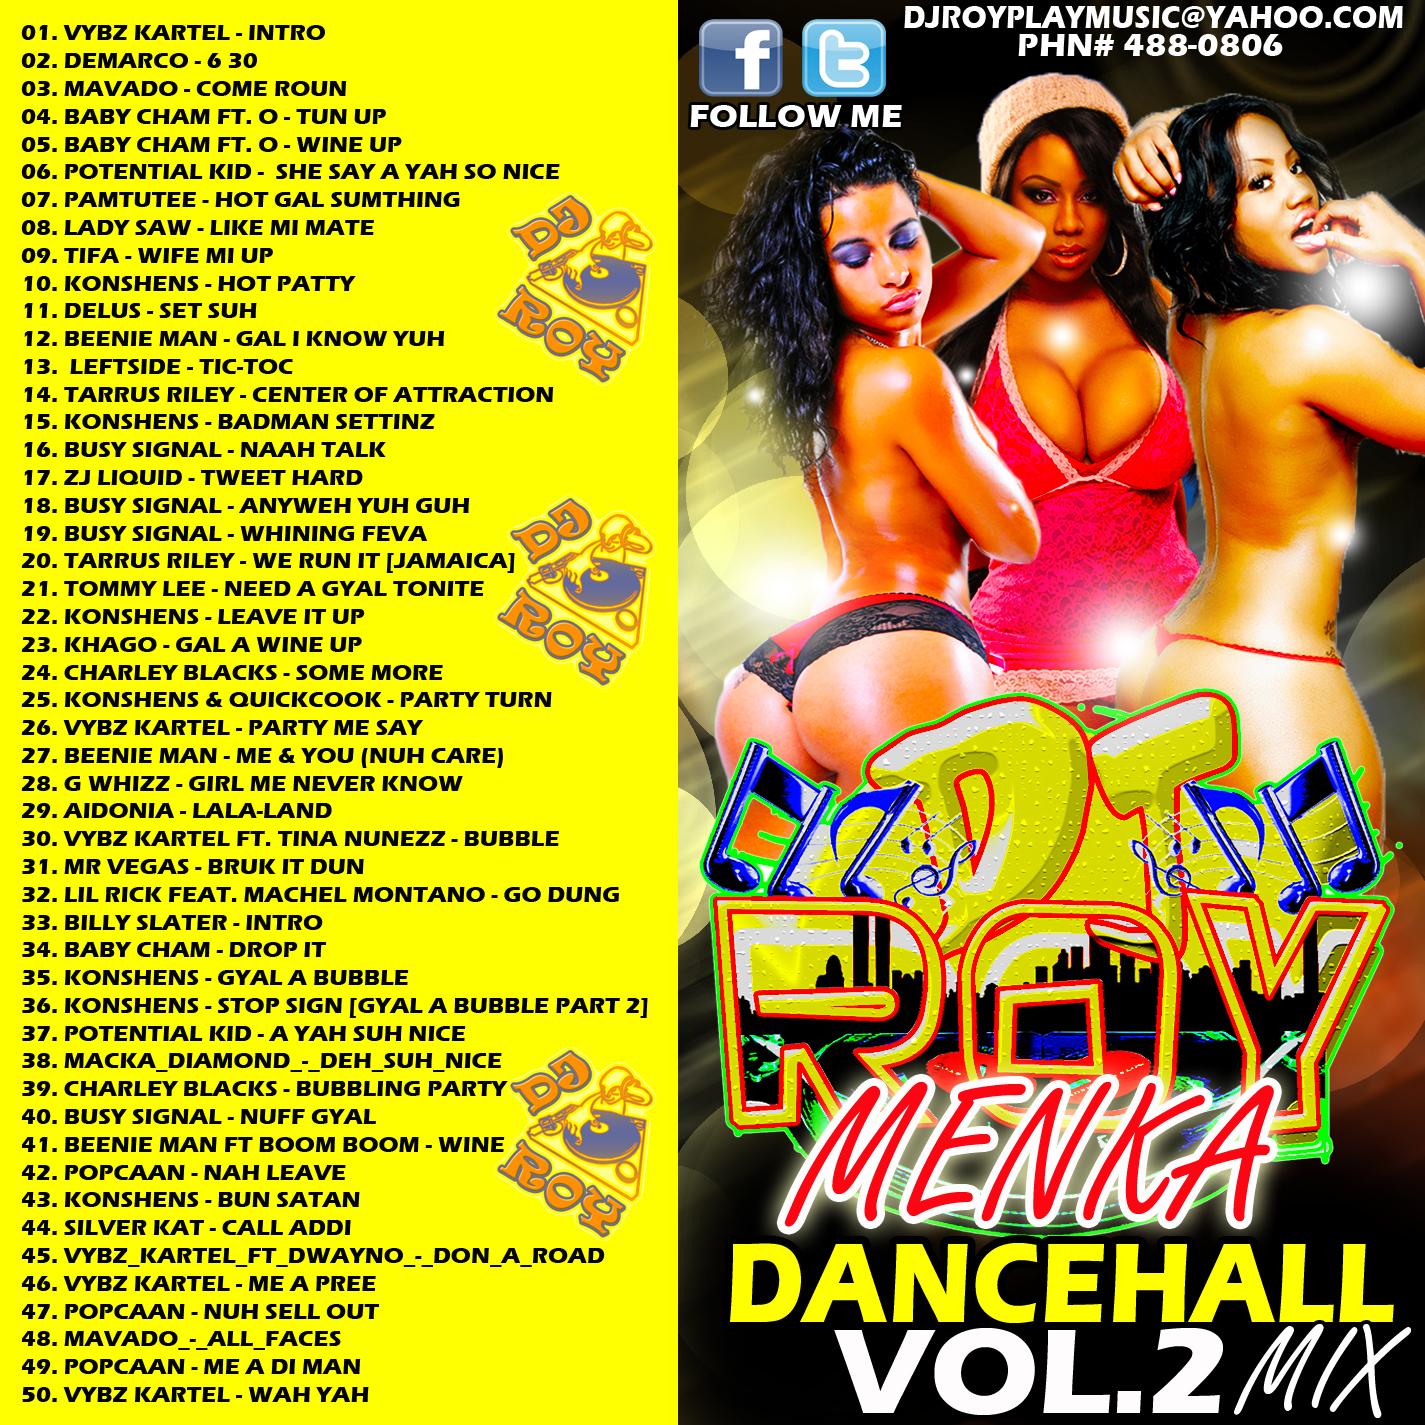 http://3.bp.blogspot.com/-uPOn4K7O4kE/T42jPZwcWOI/AAAAAAAAUts/hz9HAg8Y2wo/s1600/DJ+ROY+MENKA+MIX+VOL.2+2K12.jpg